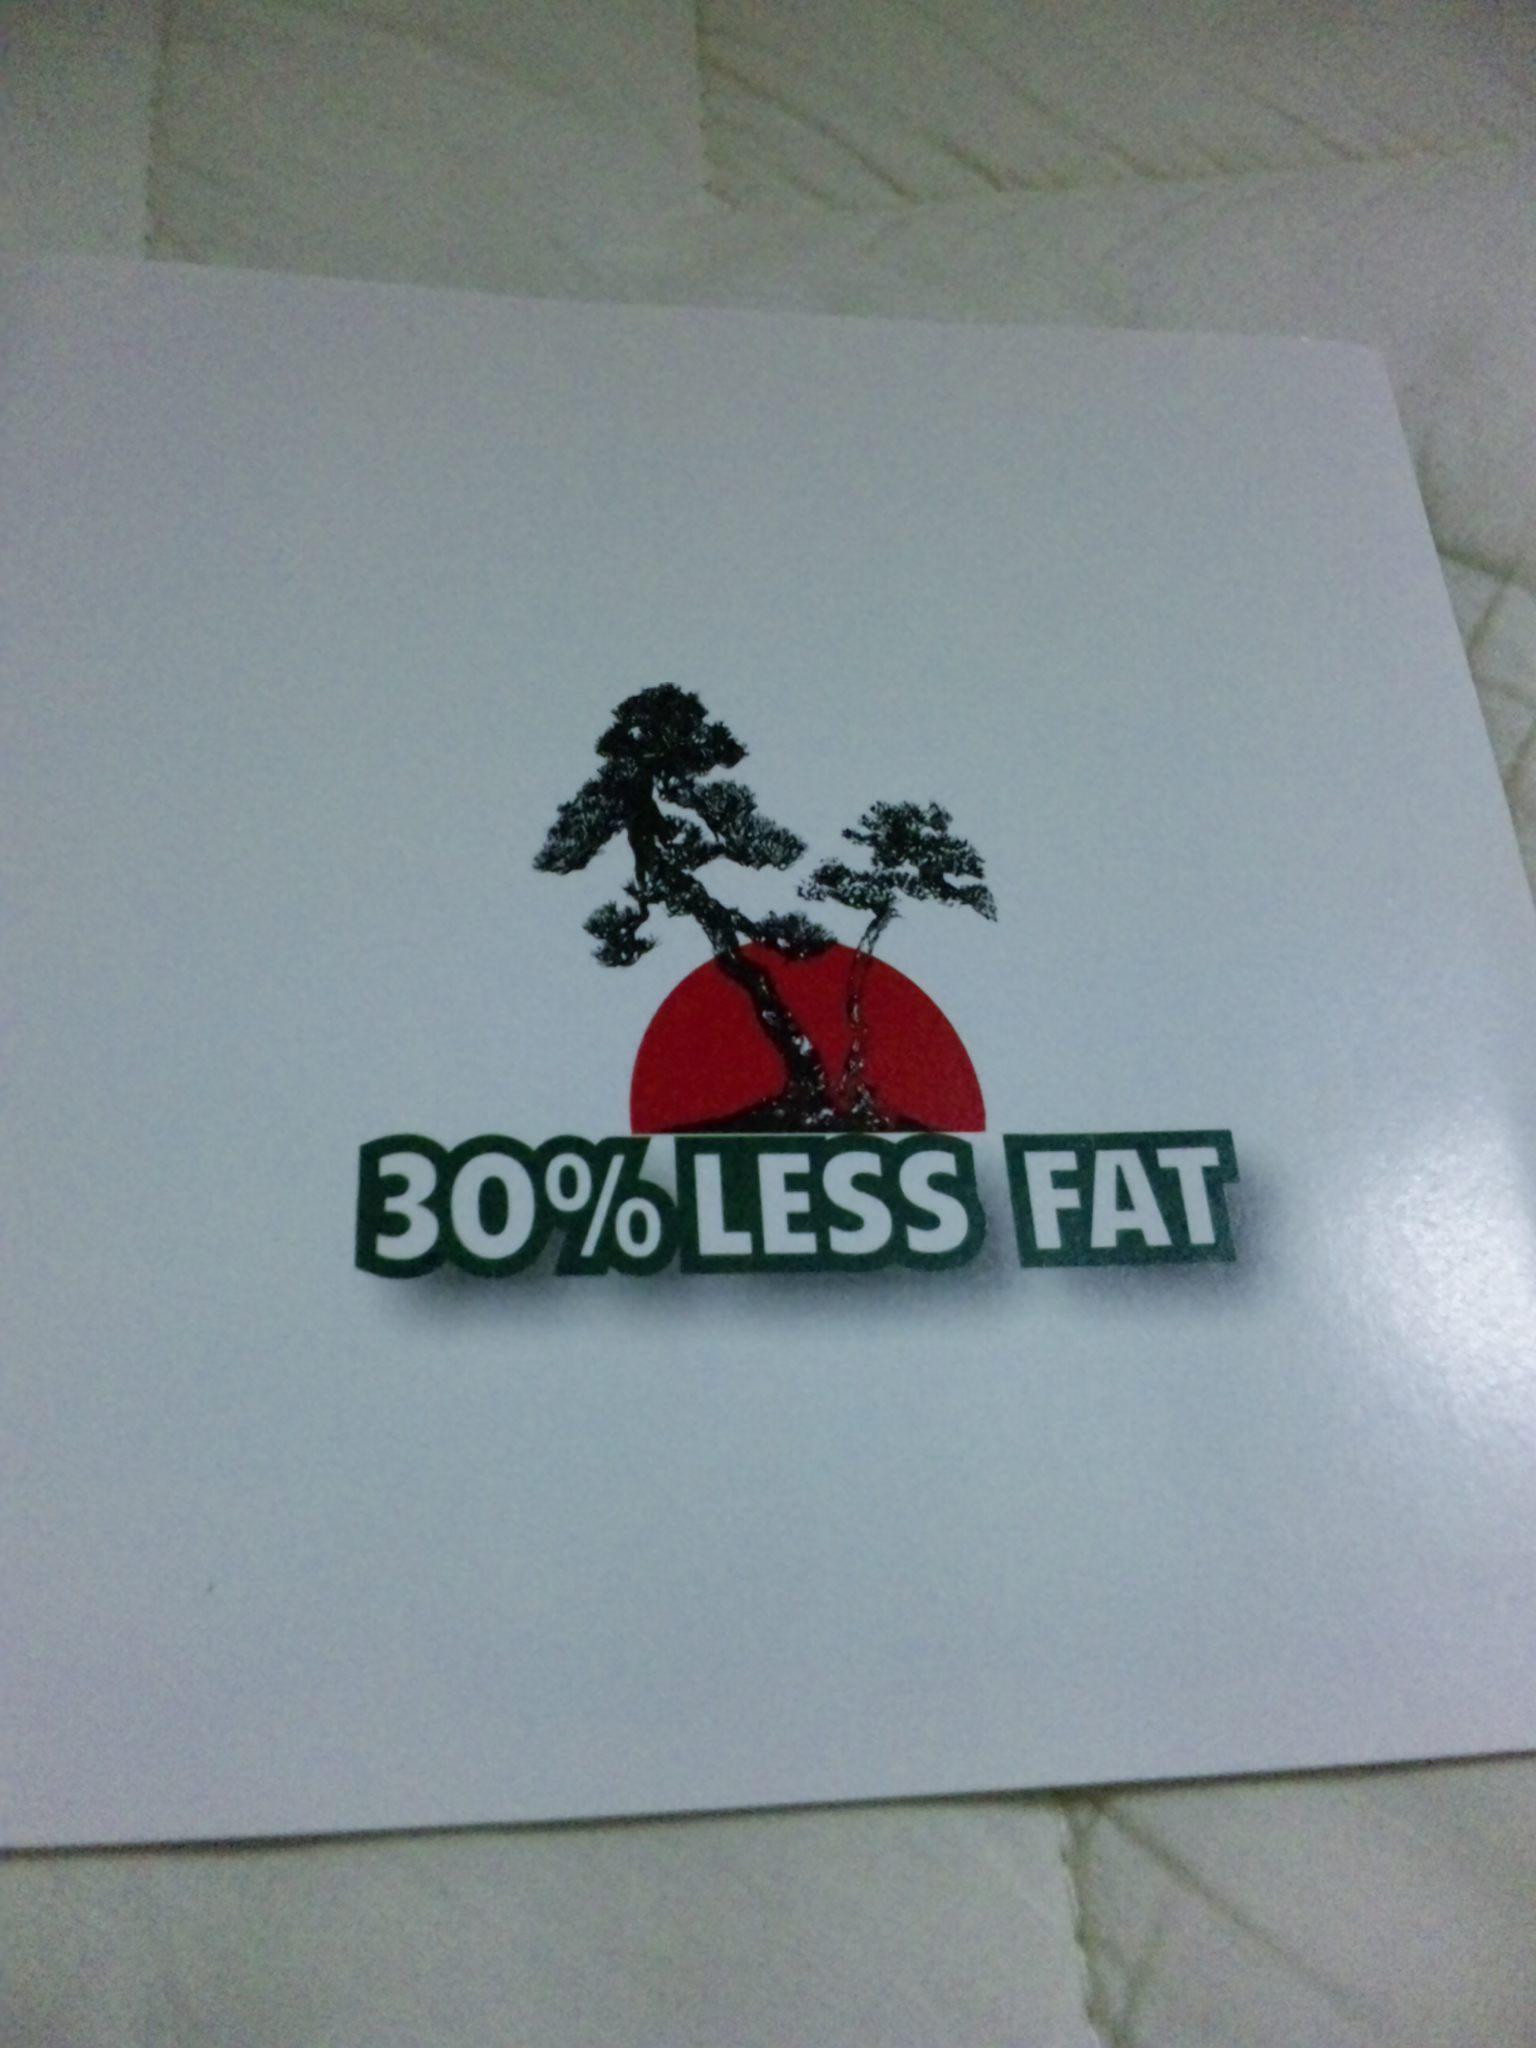 30%LESS FAT